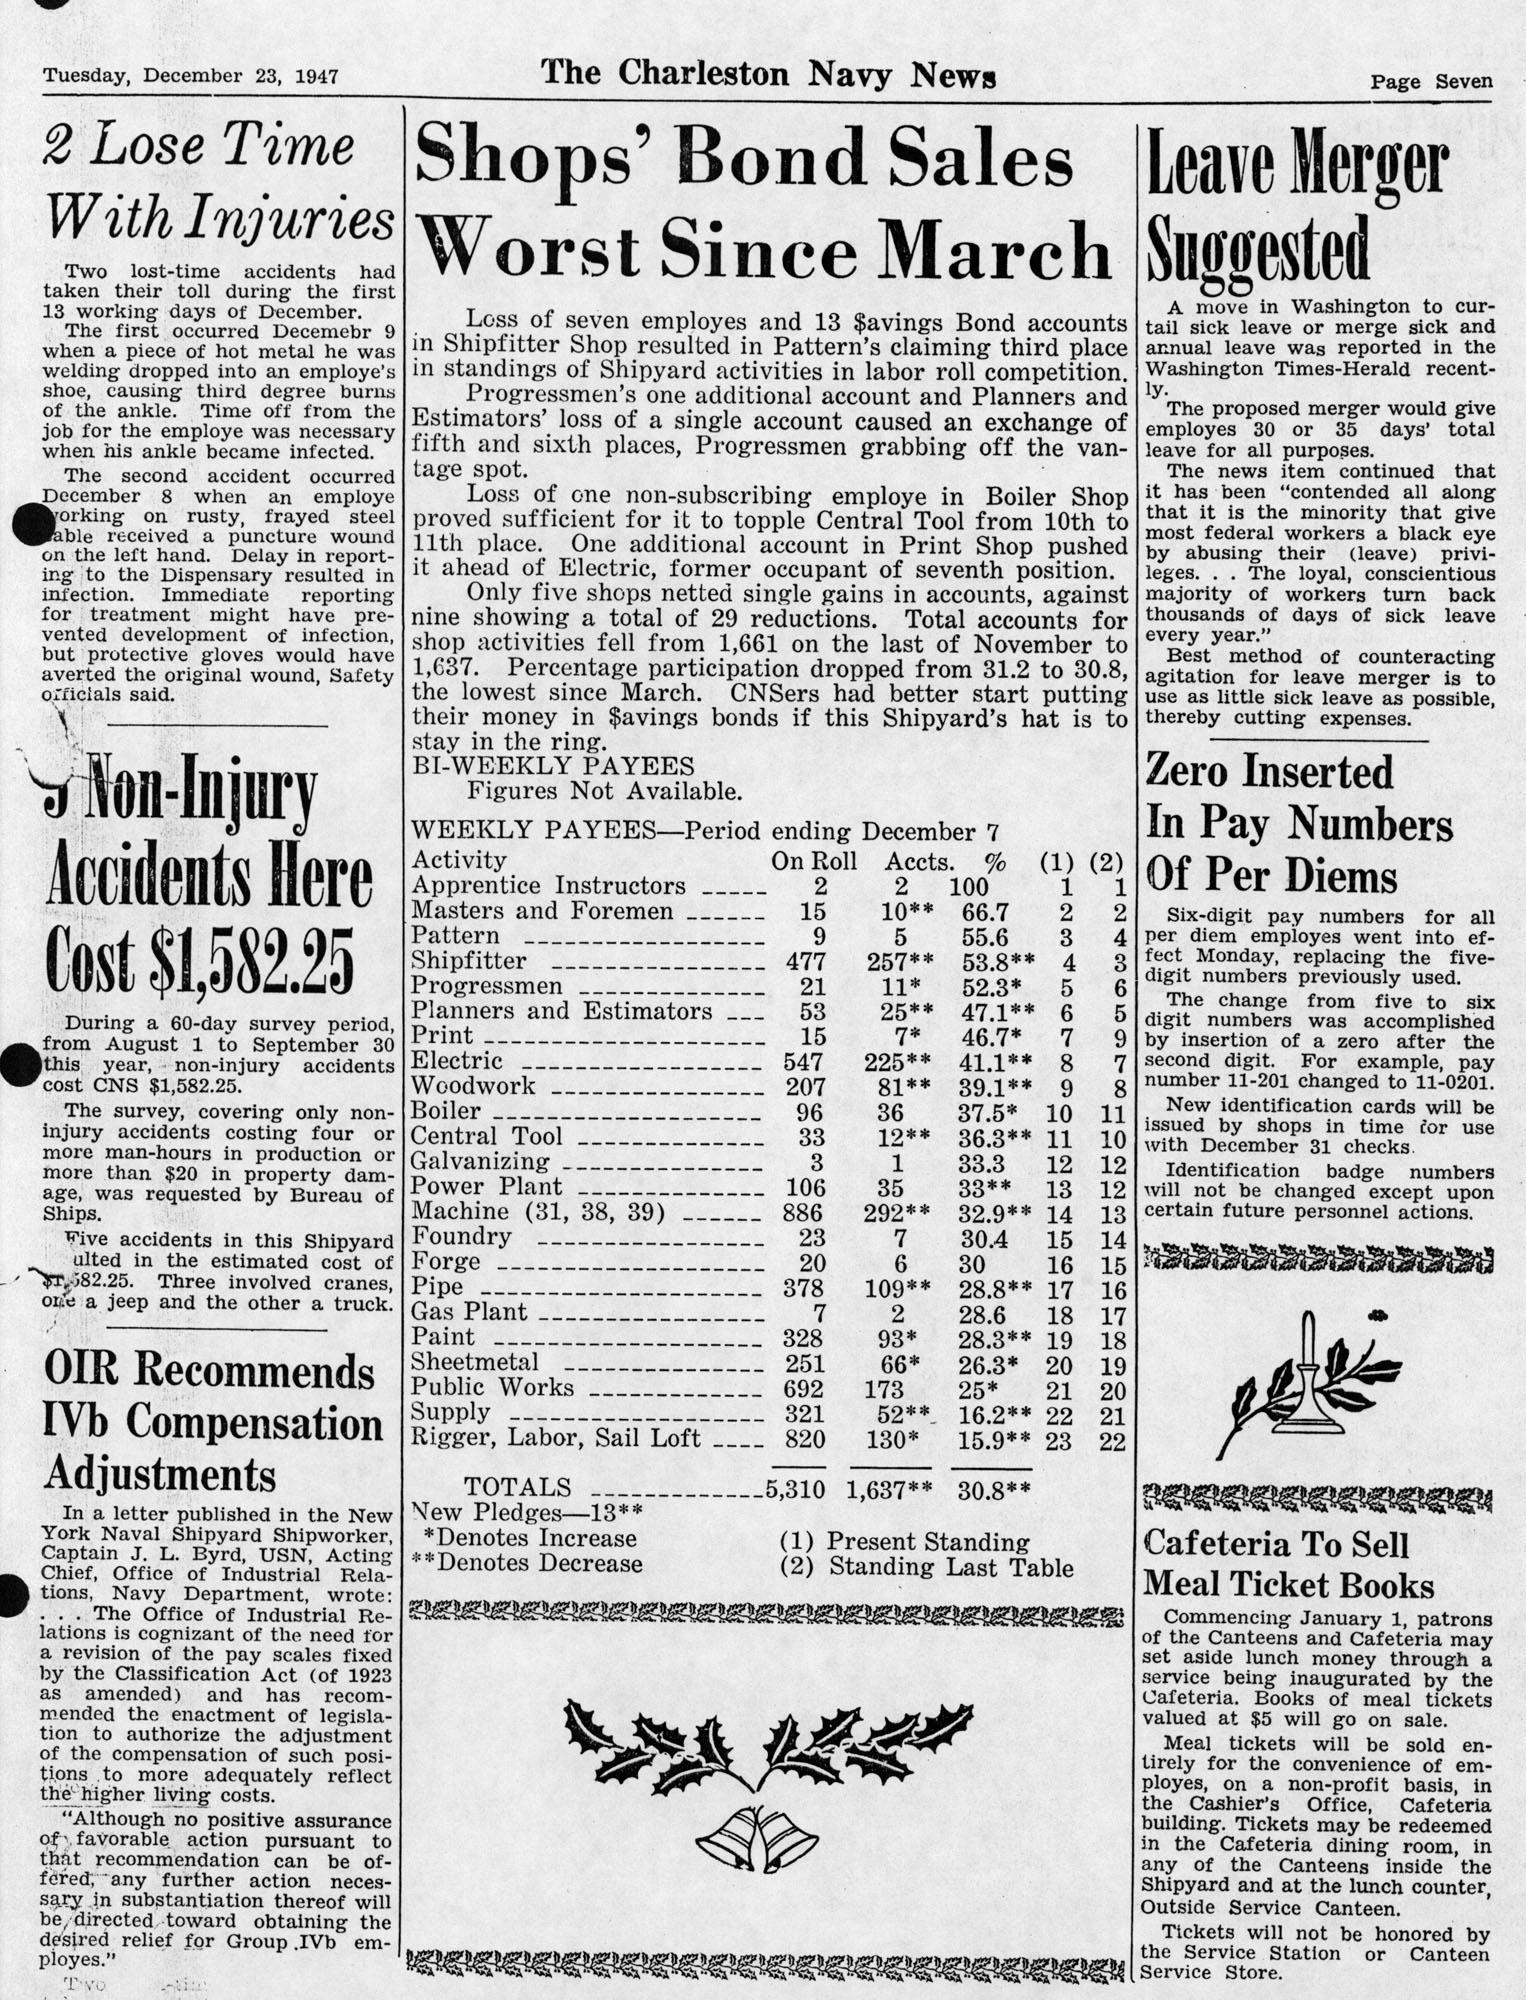 The Charleston Navy News, Volume 6, Edition 11, page vii